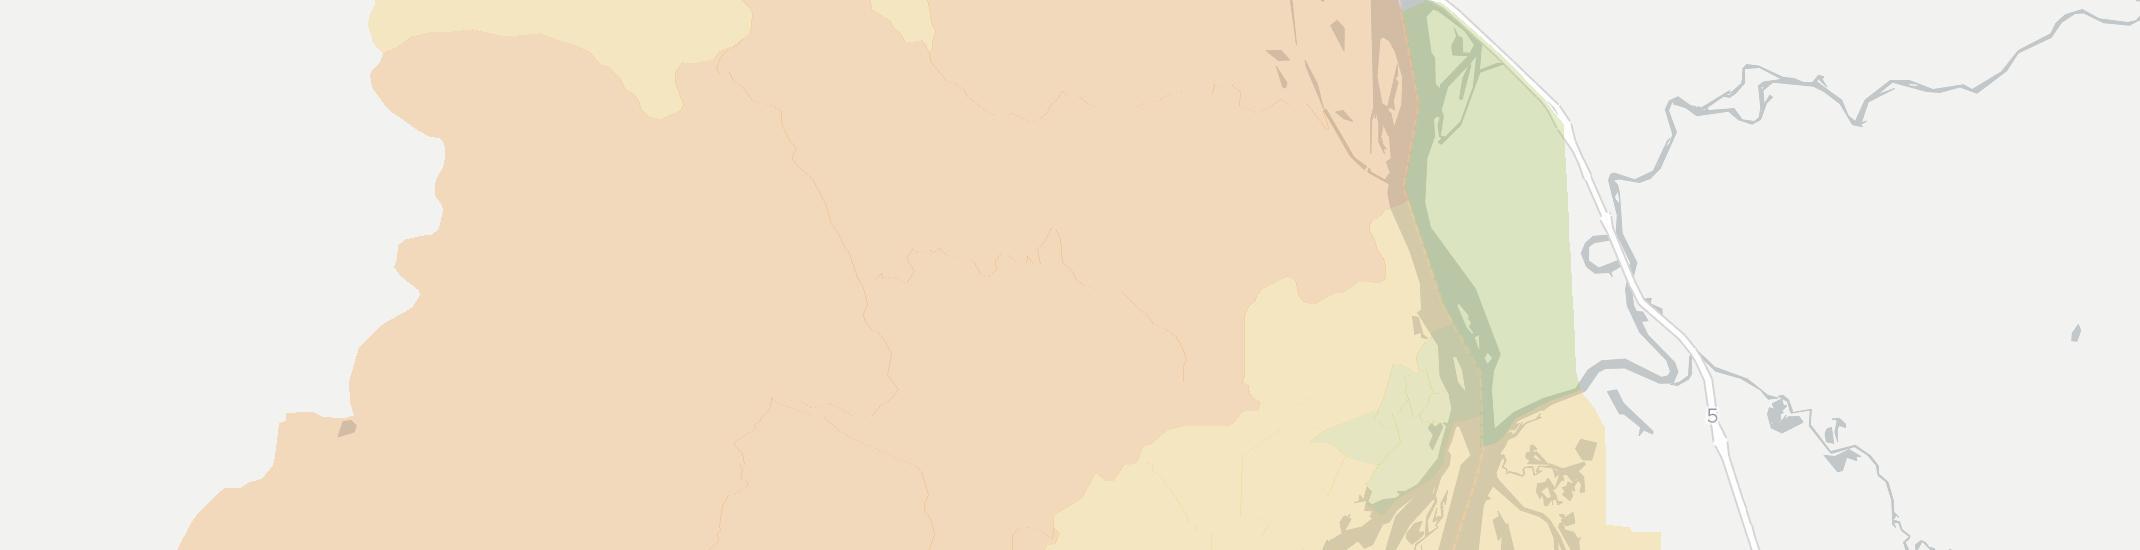 Saint Helens Or Has 14 Internet Service Providers Broadbandnow Com